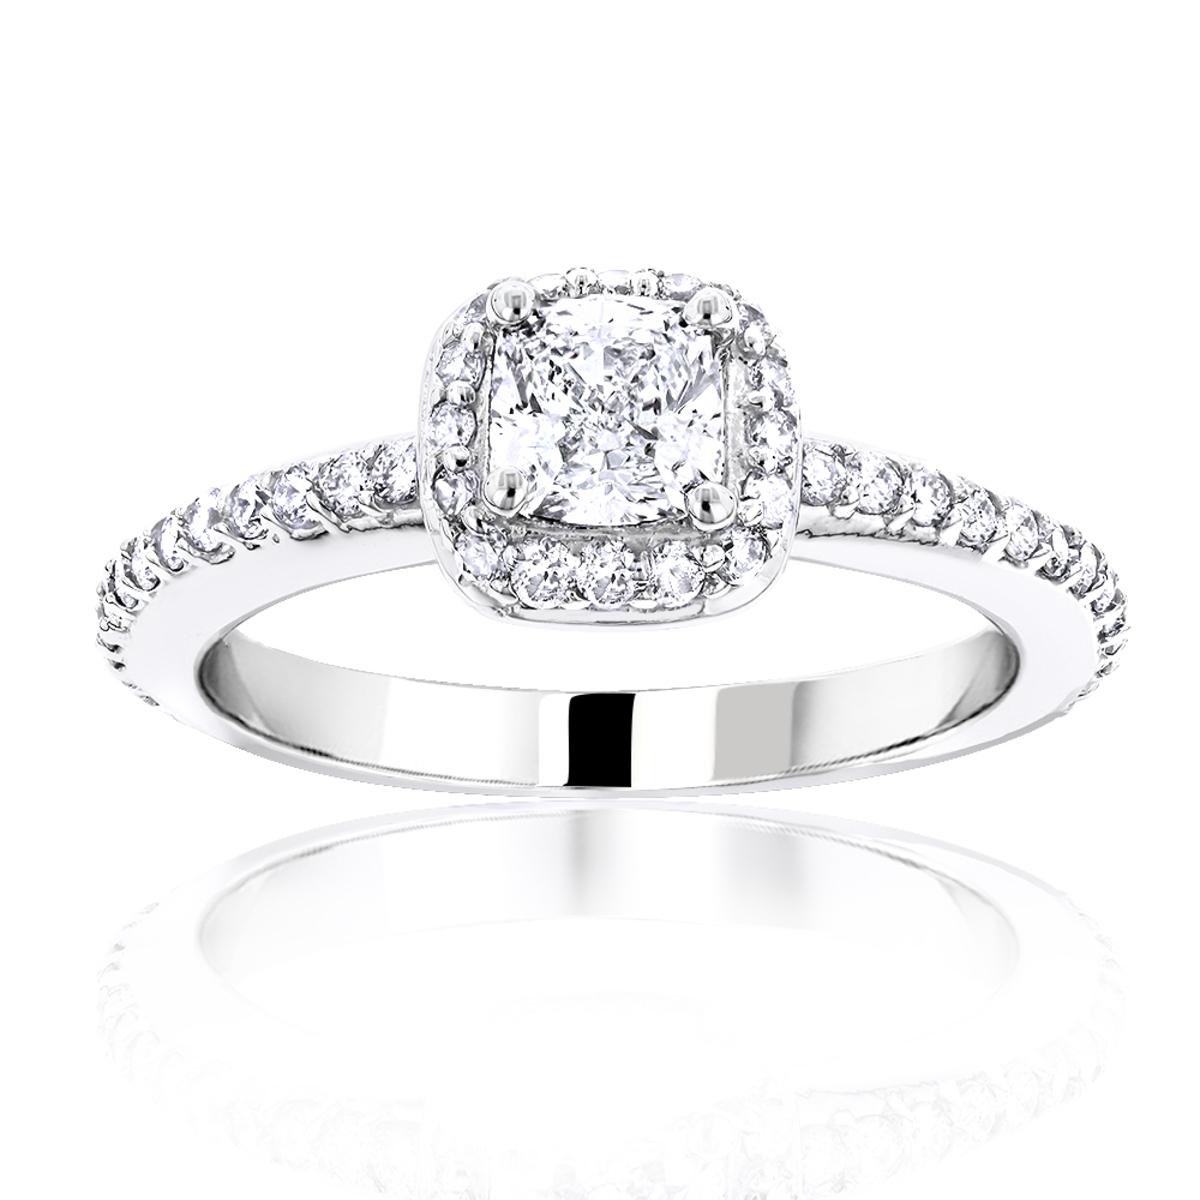 1 Carat Cushion Cut Diamond Engagement Ring 14K Gold Halo Design